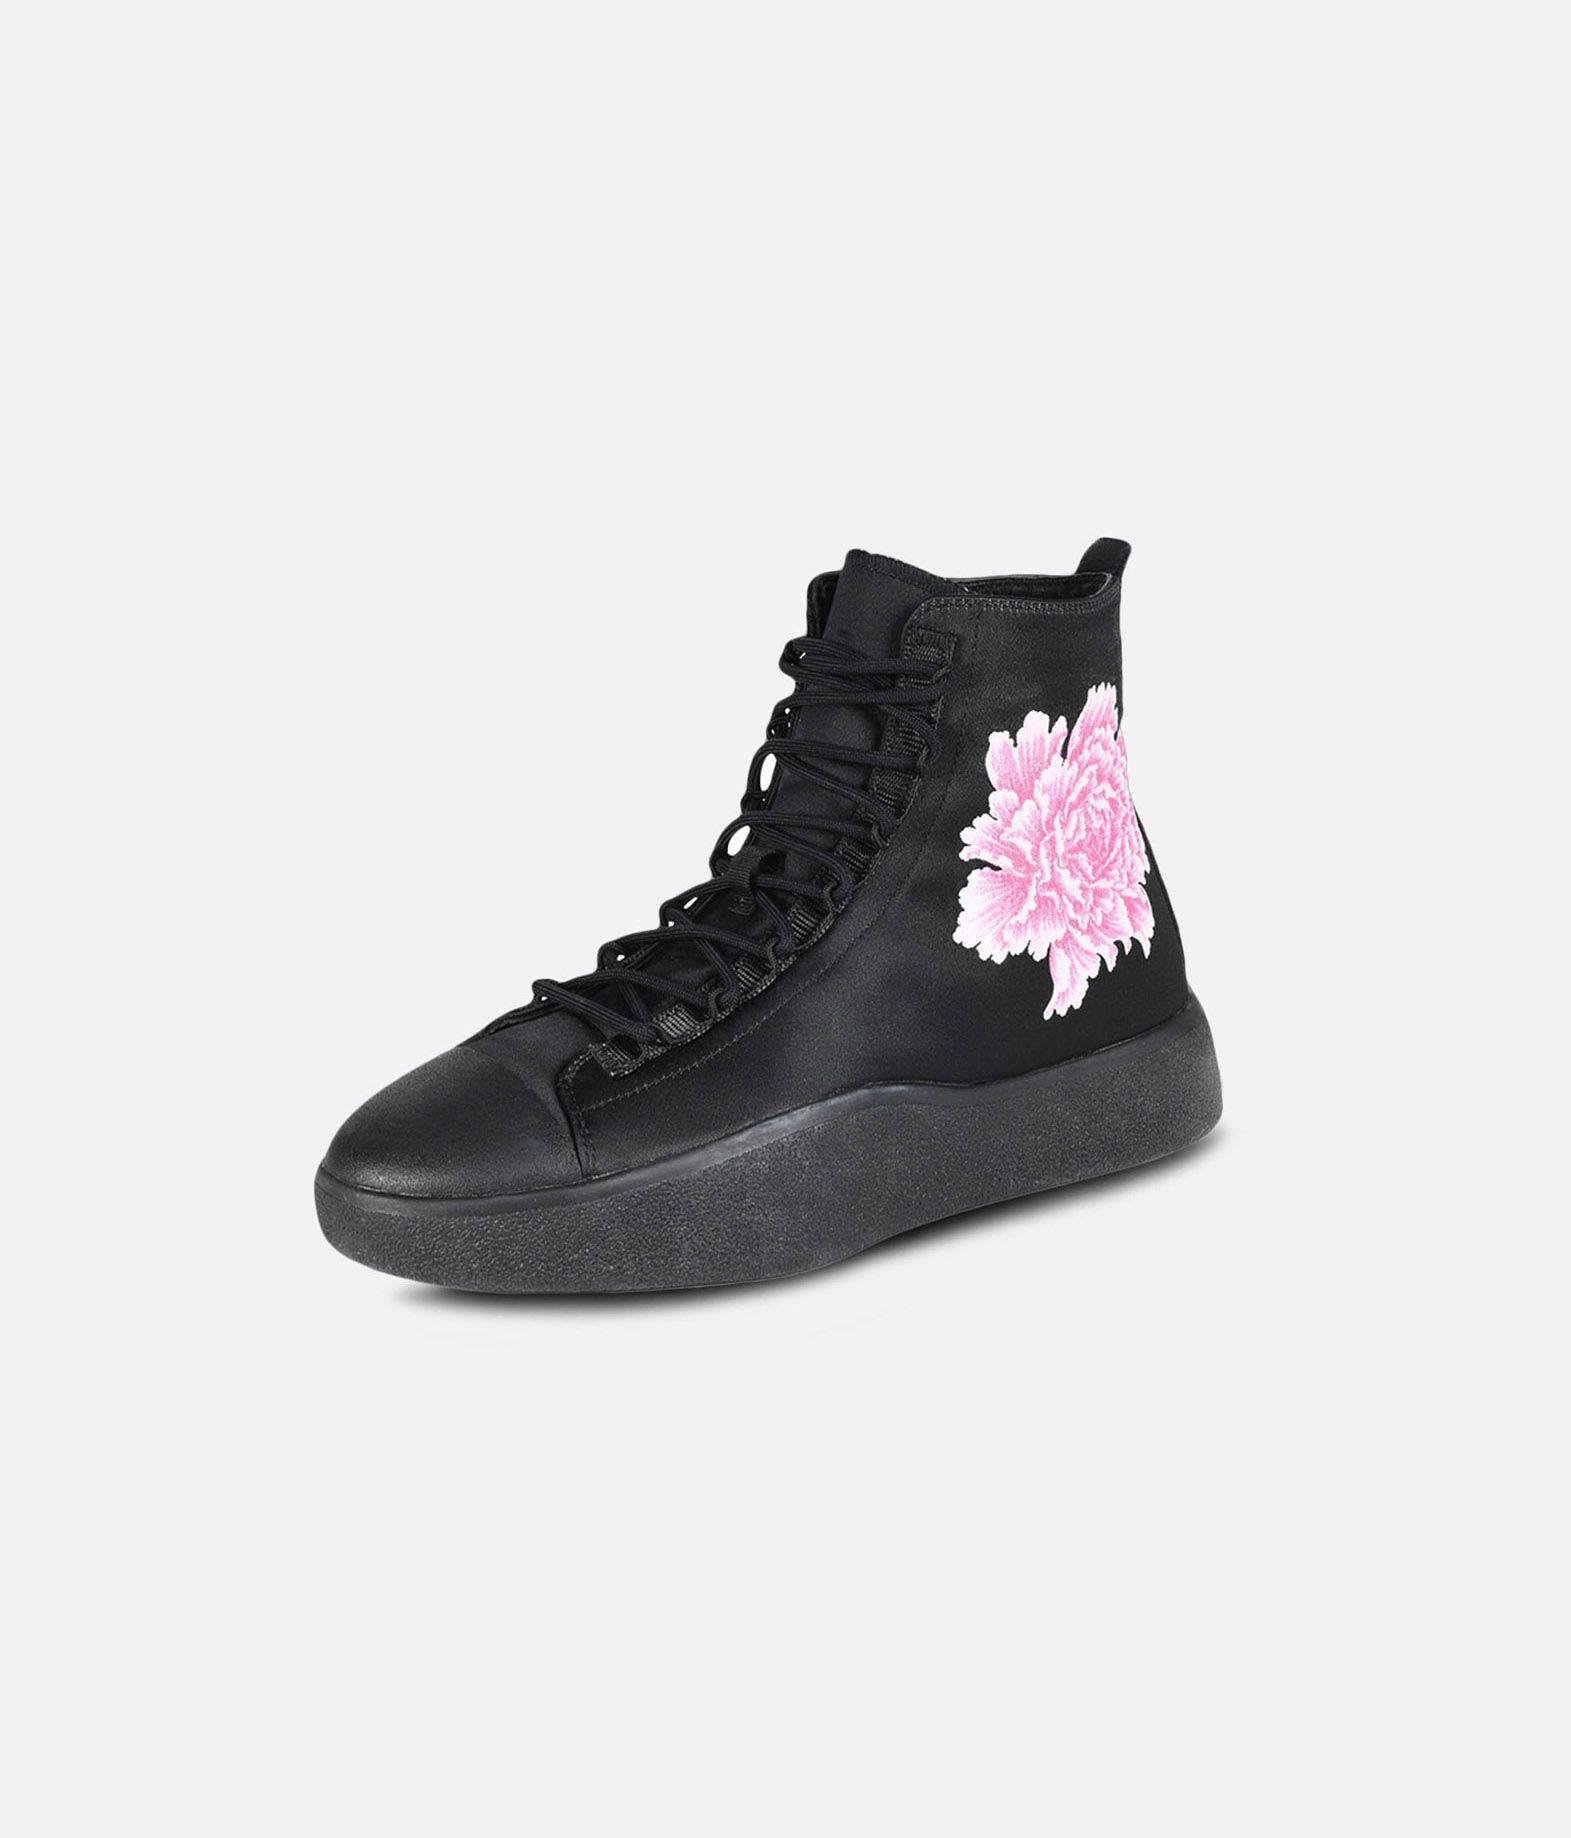 Y-3 Y-3 BASHYO High-top sneakers E r